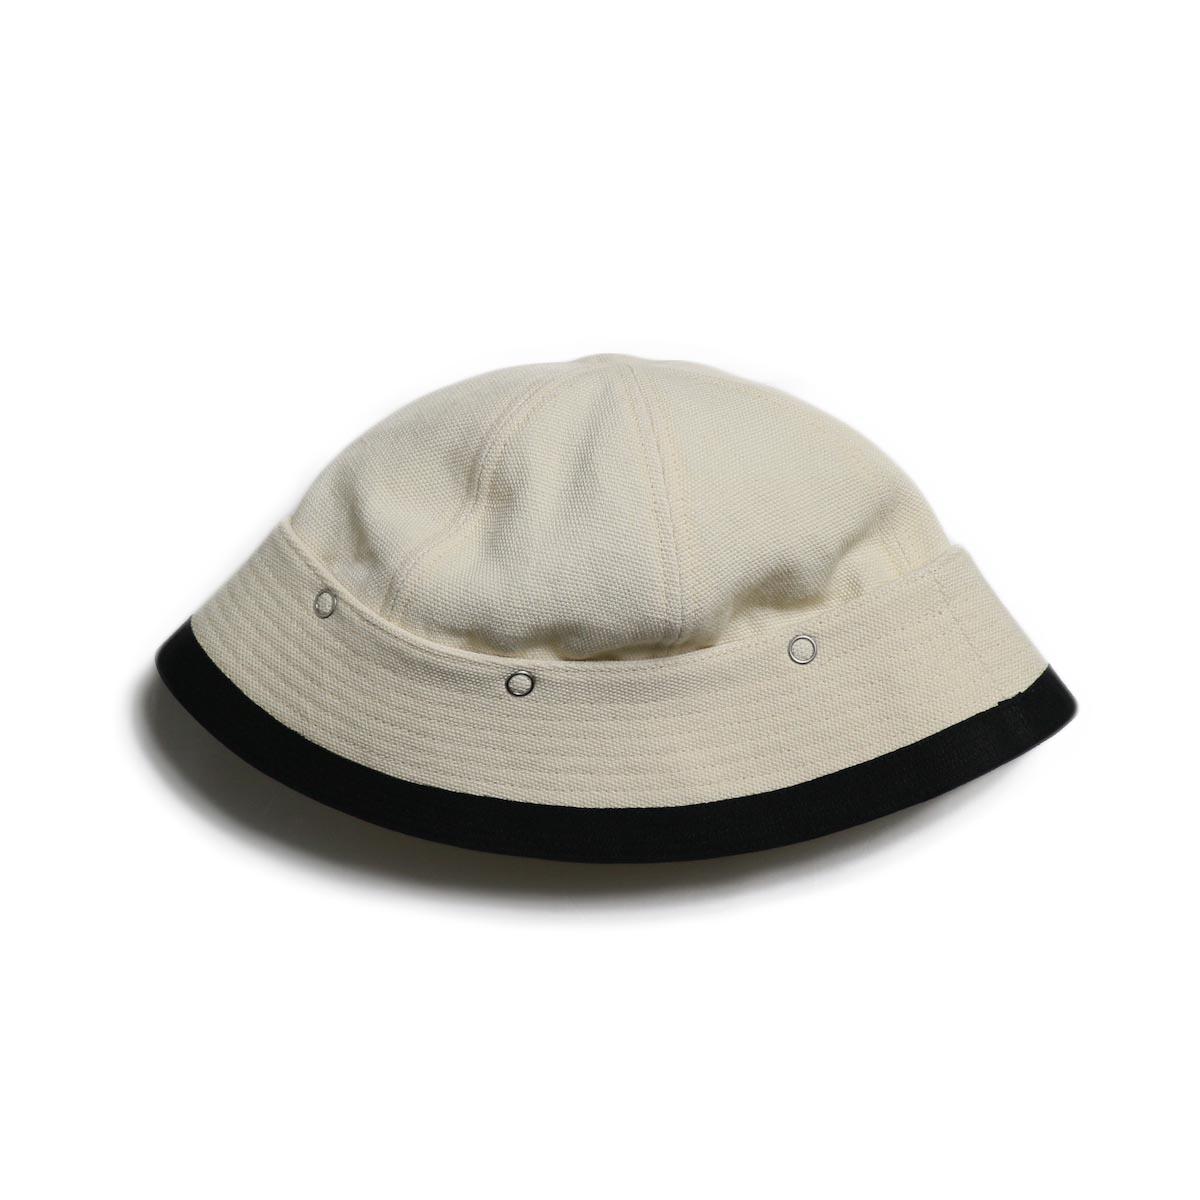 FUMIKA UCHIDA / Cotton Linen Cambus Hat -White